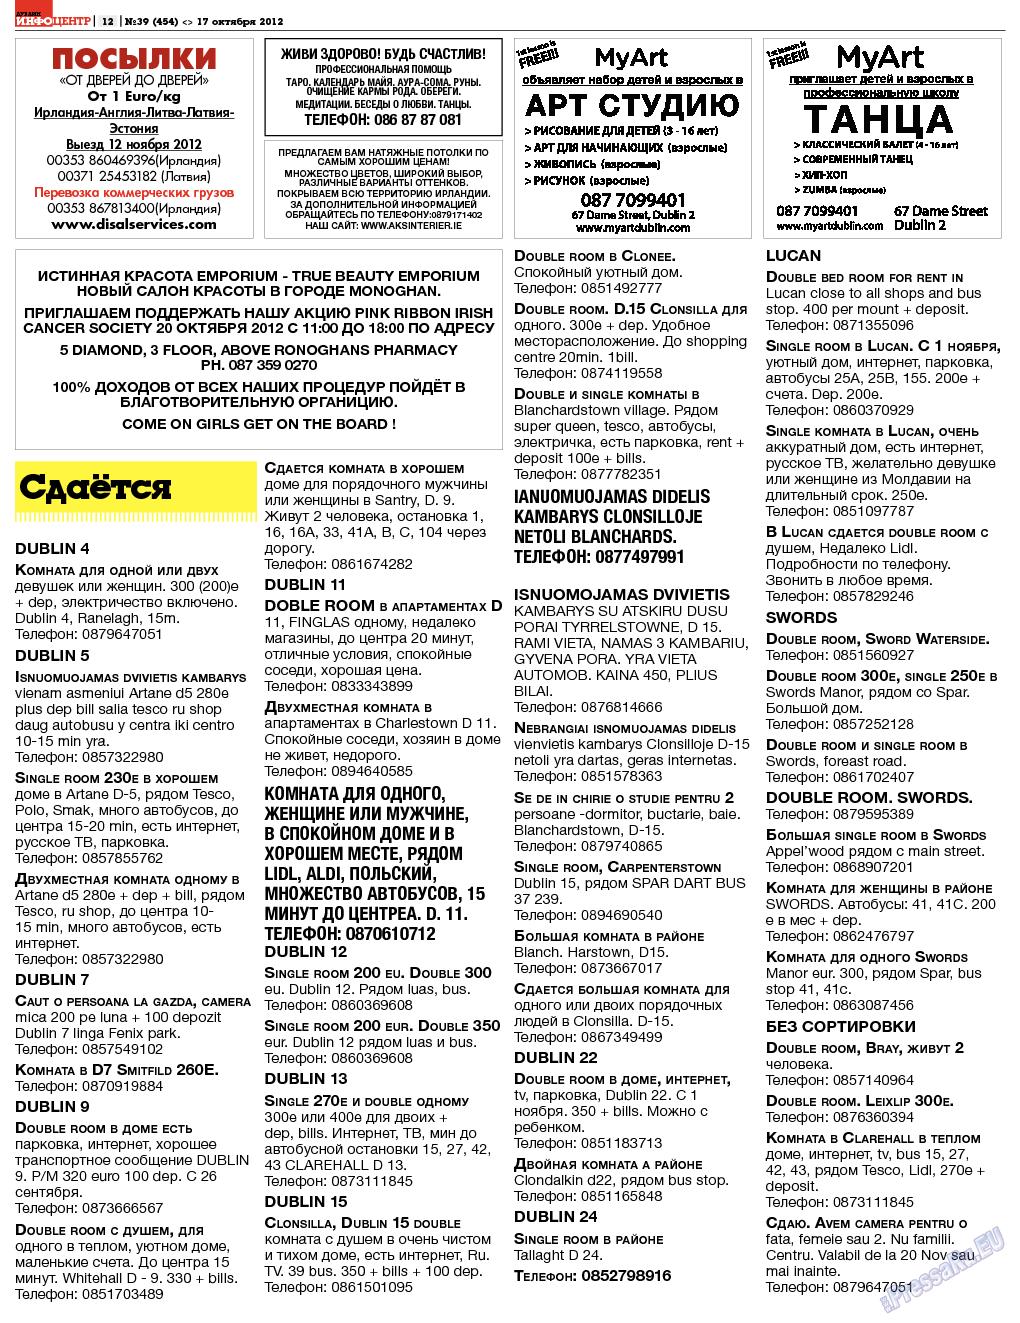 Дублин инфоцентр (газета). 2012 год, номер 38, стр. 12